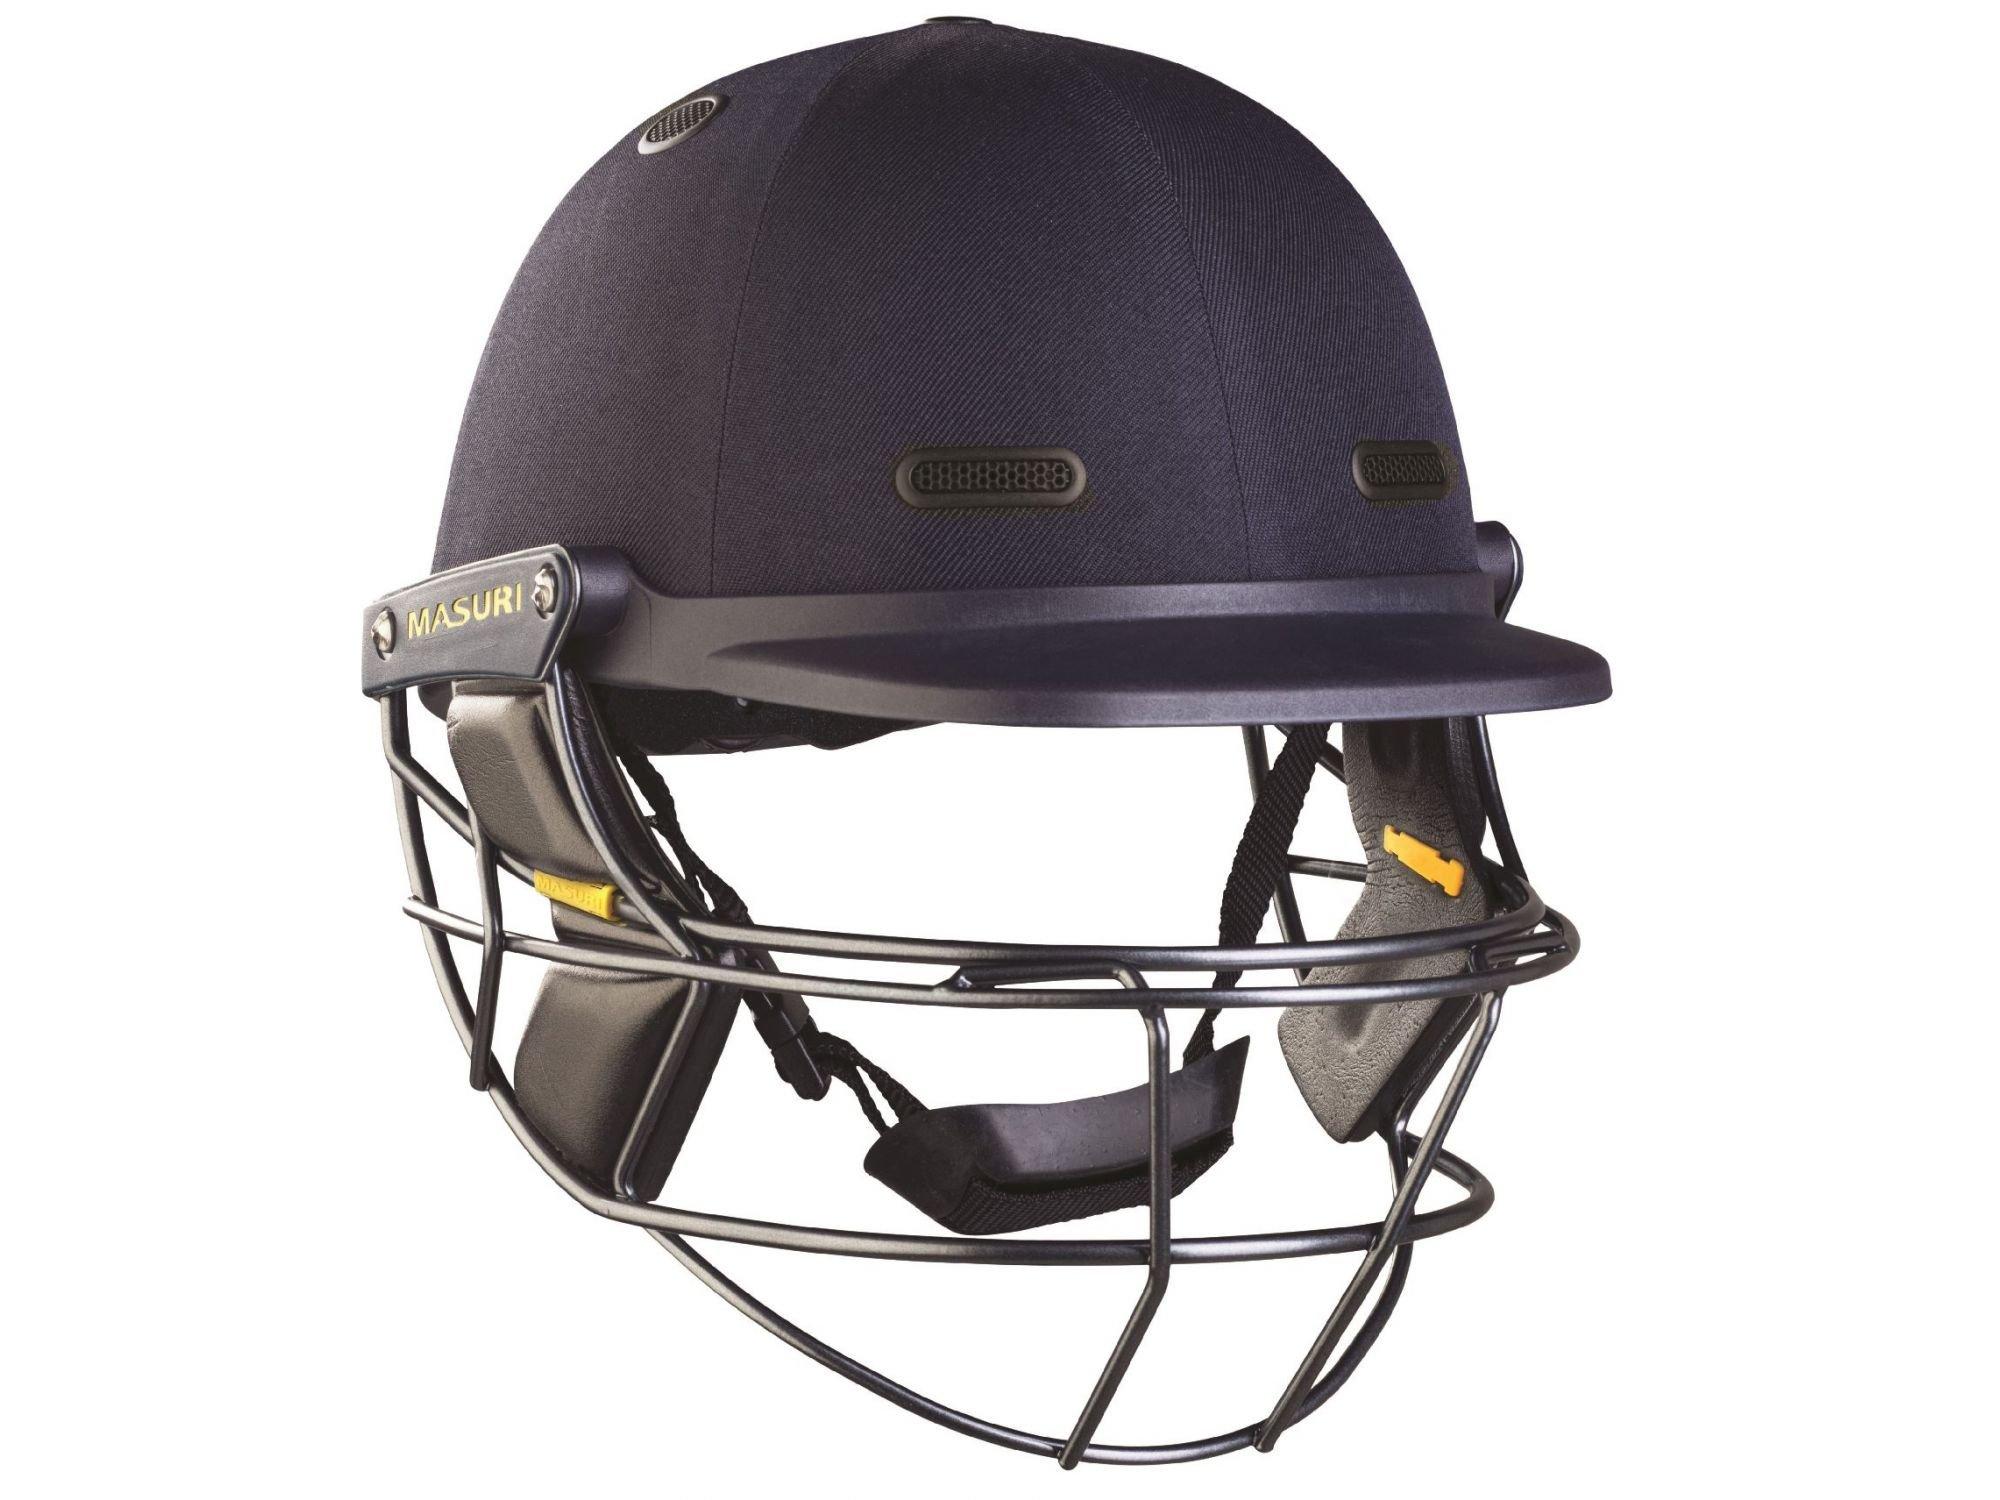 Masuri Os2 Test Titanium Cricket Helmet